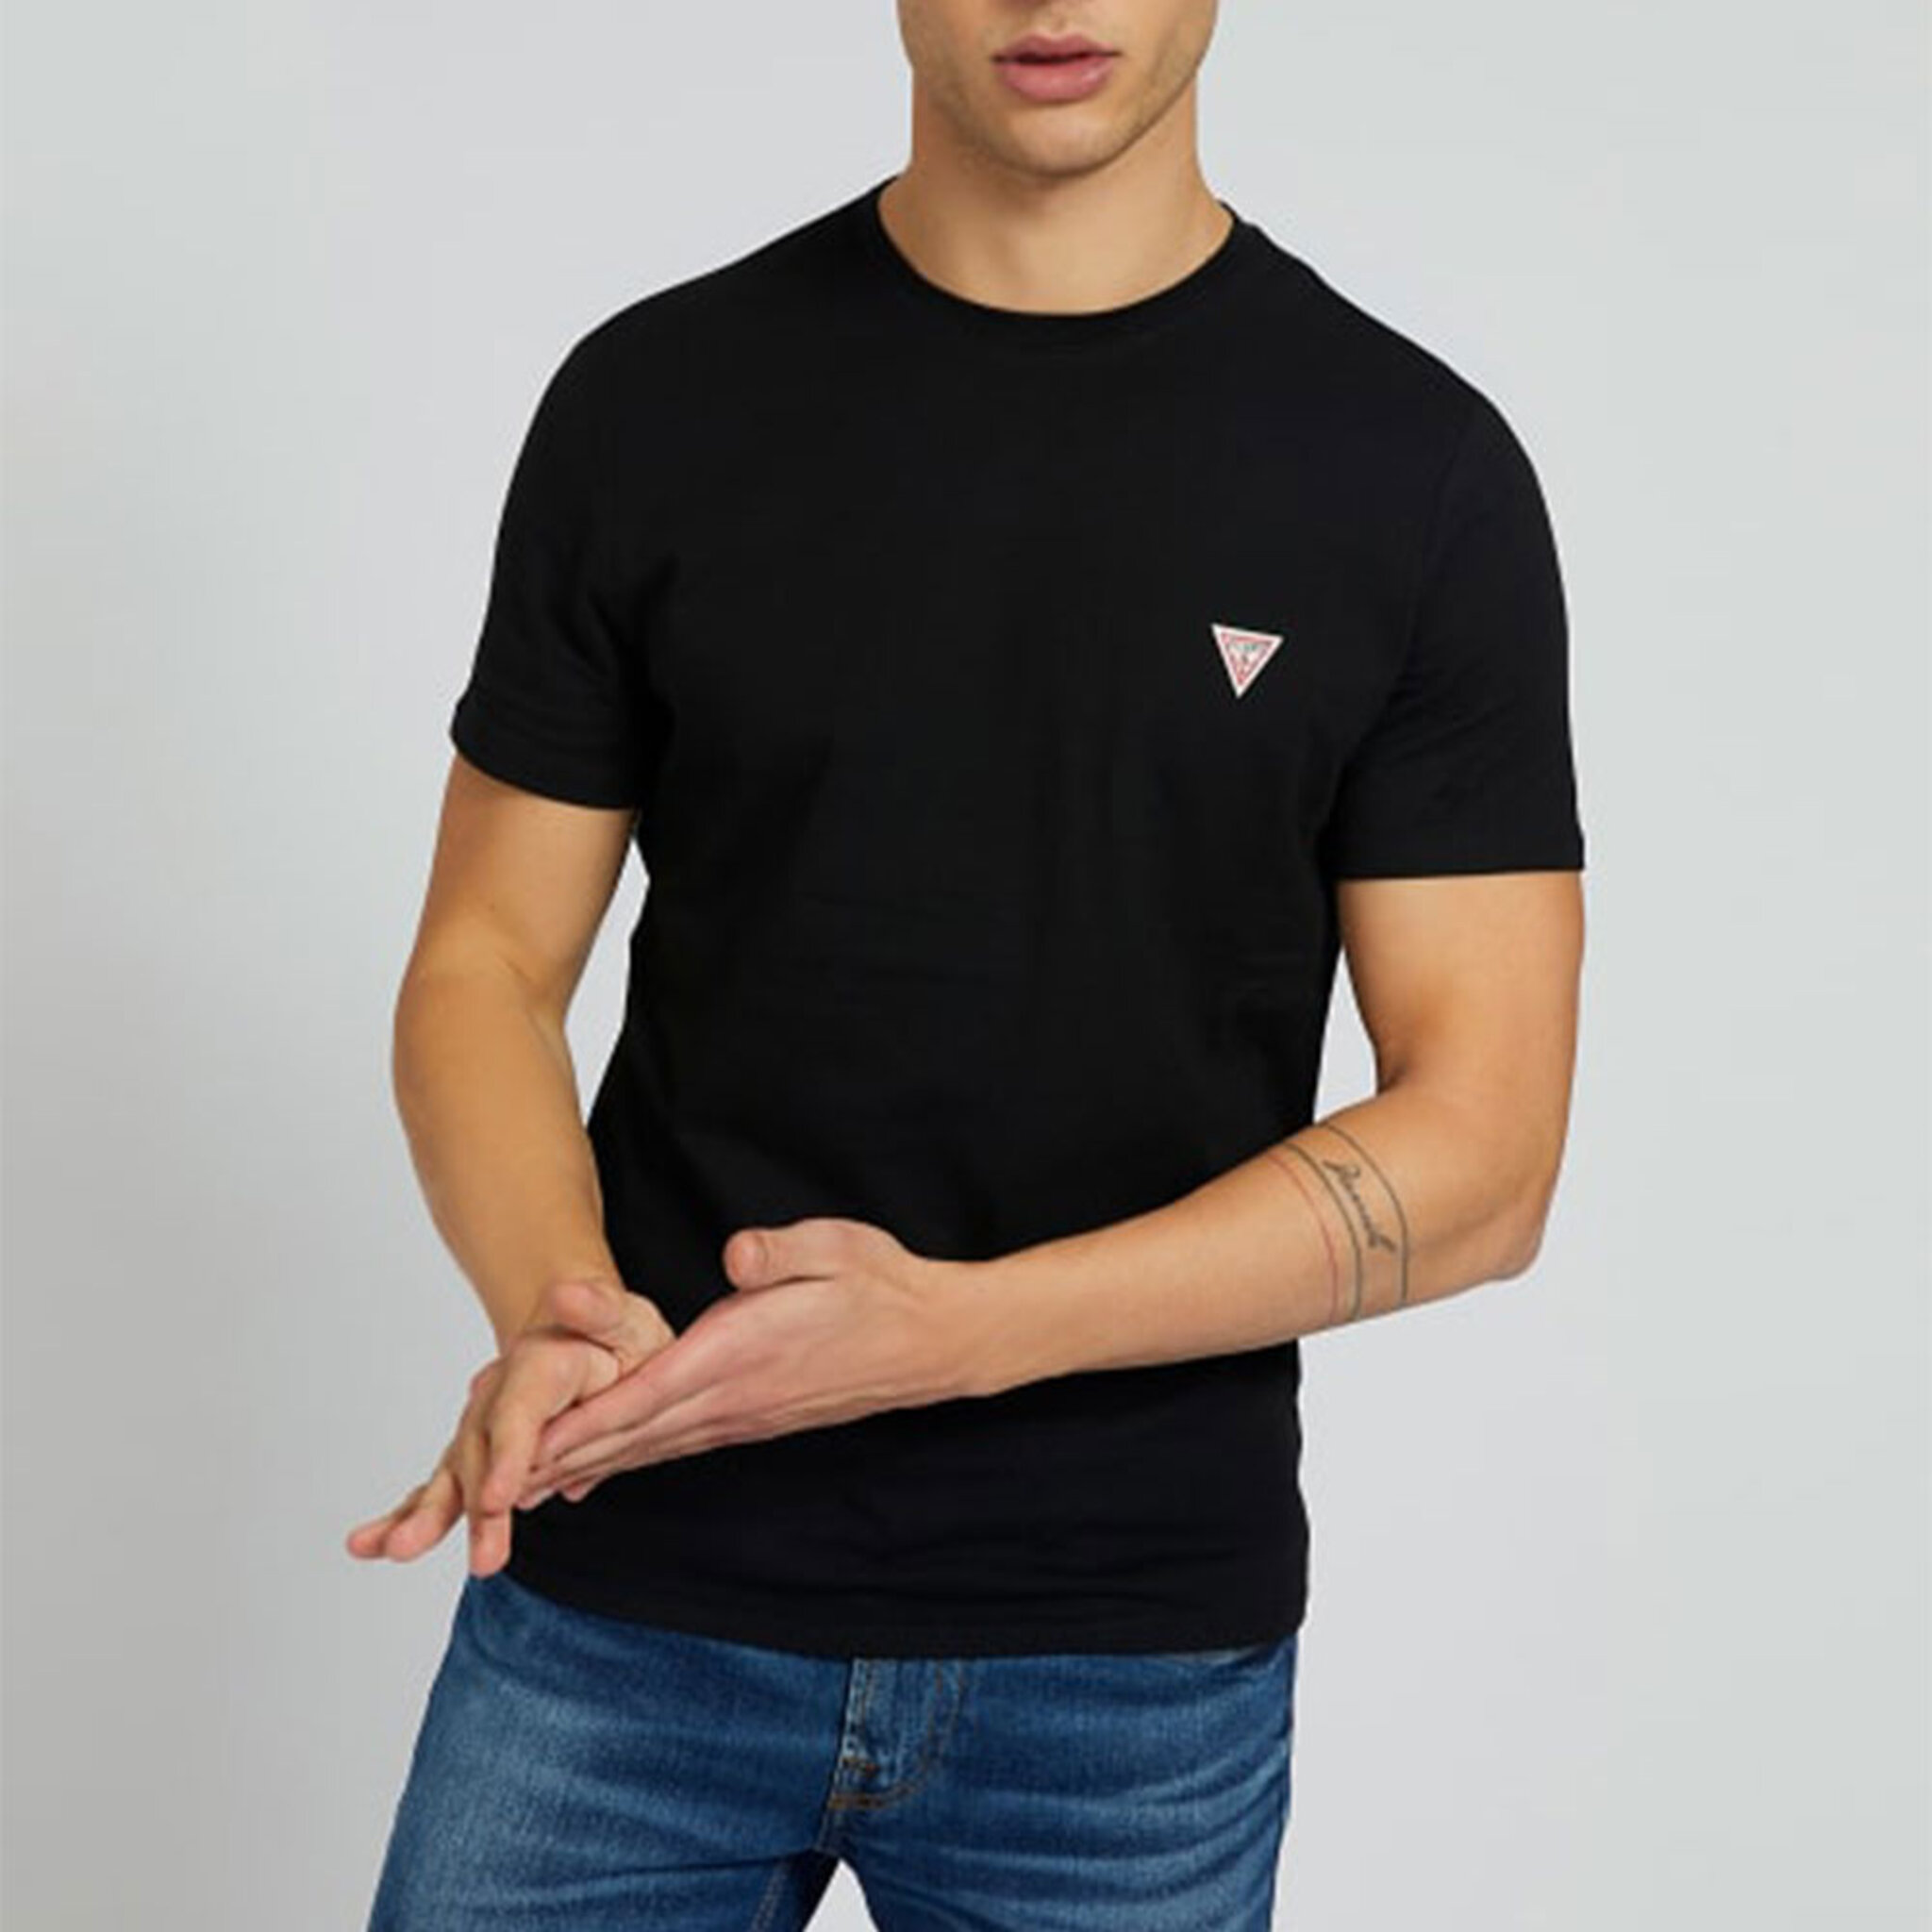 CN SS CORE SL T-shirt